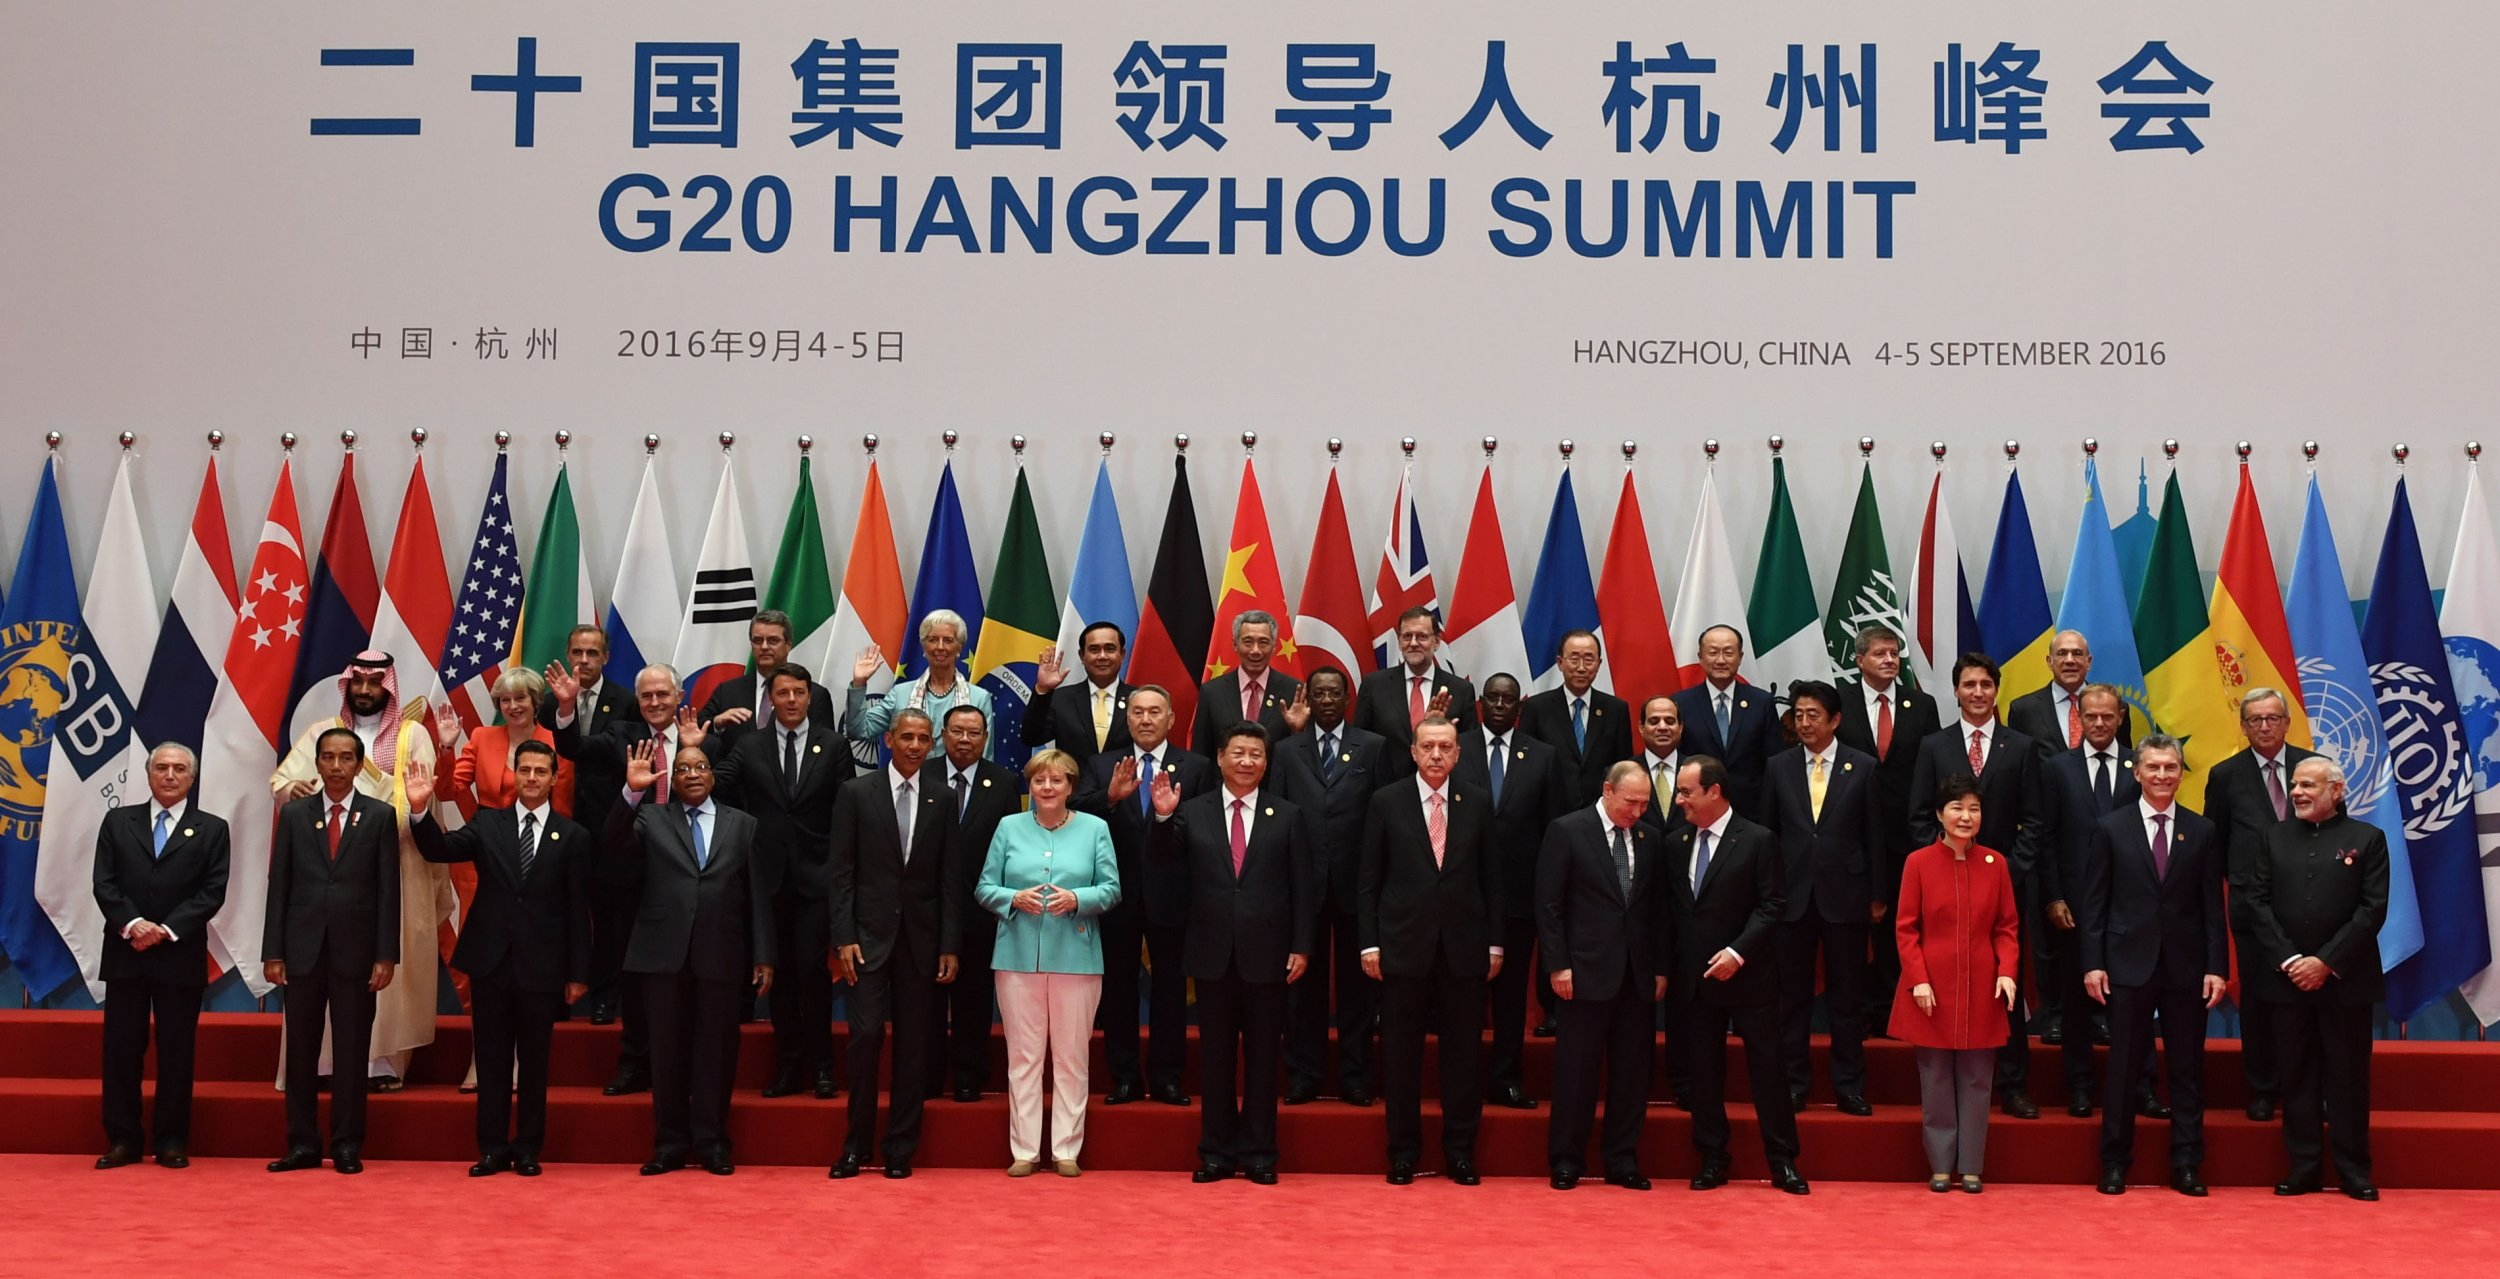 G20 2016